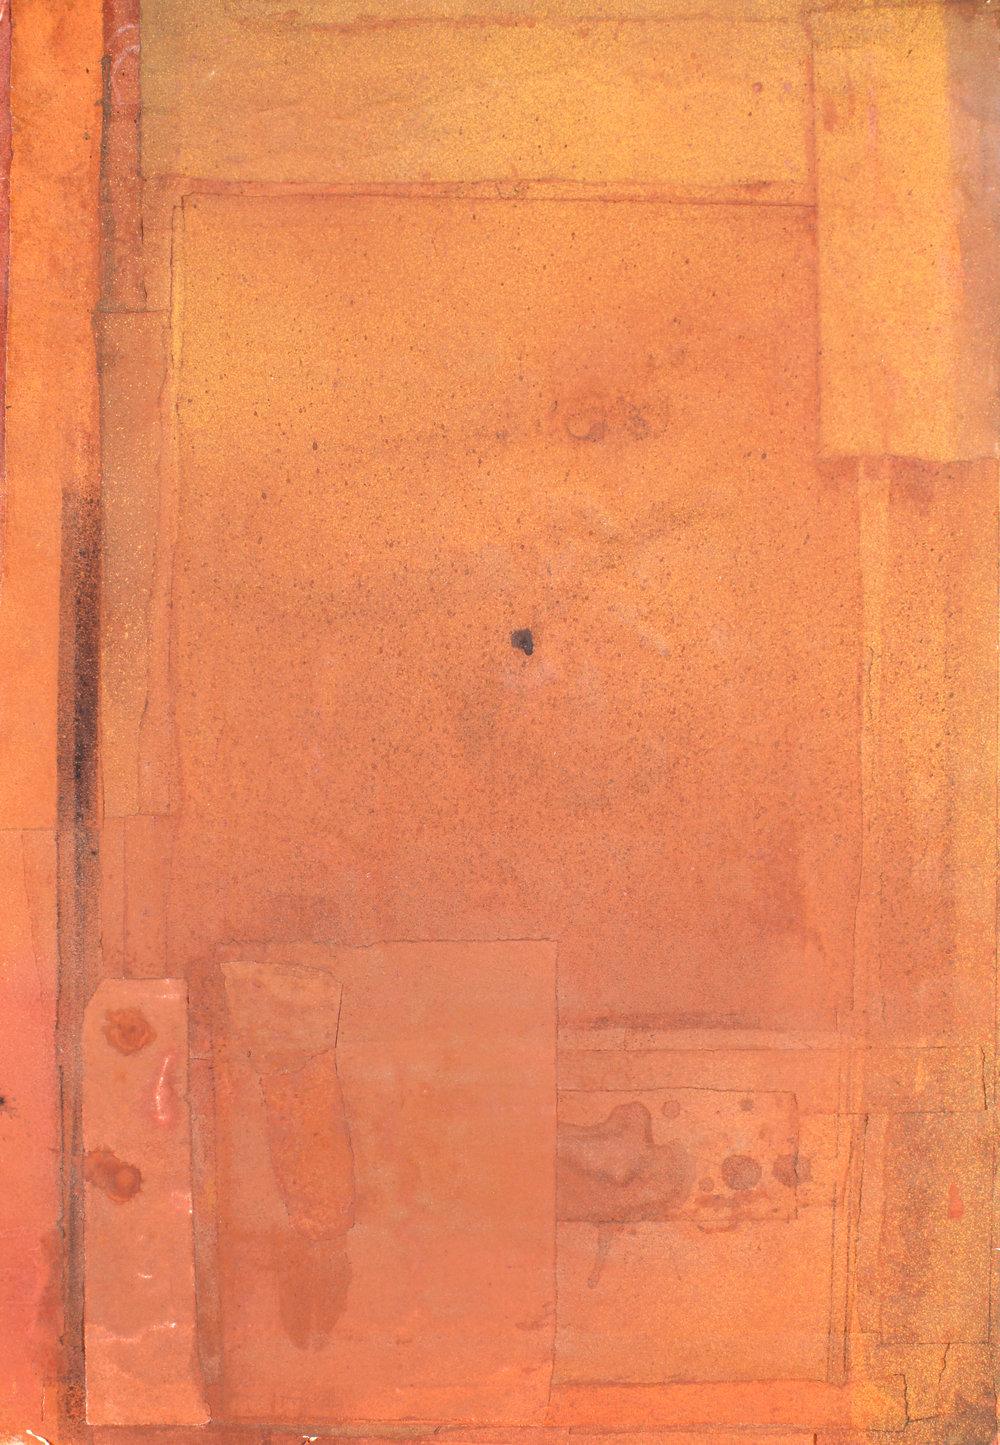 1976_SealsofTimeT_gouacheandcollageonpaper_29x20_WPNF042.jpg